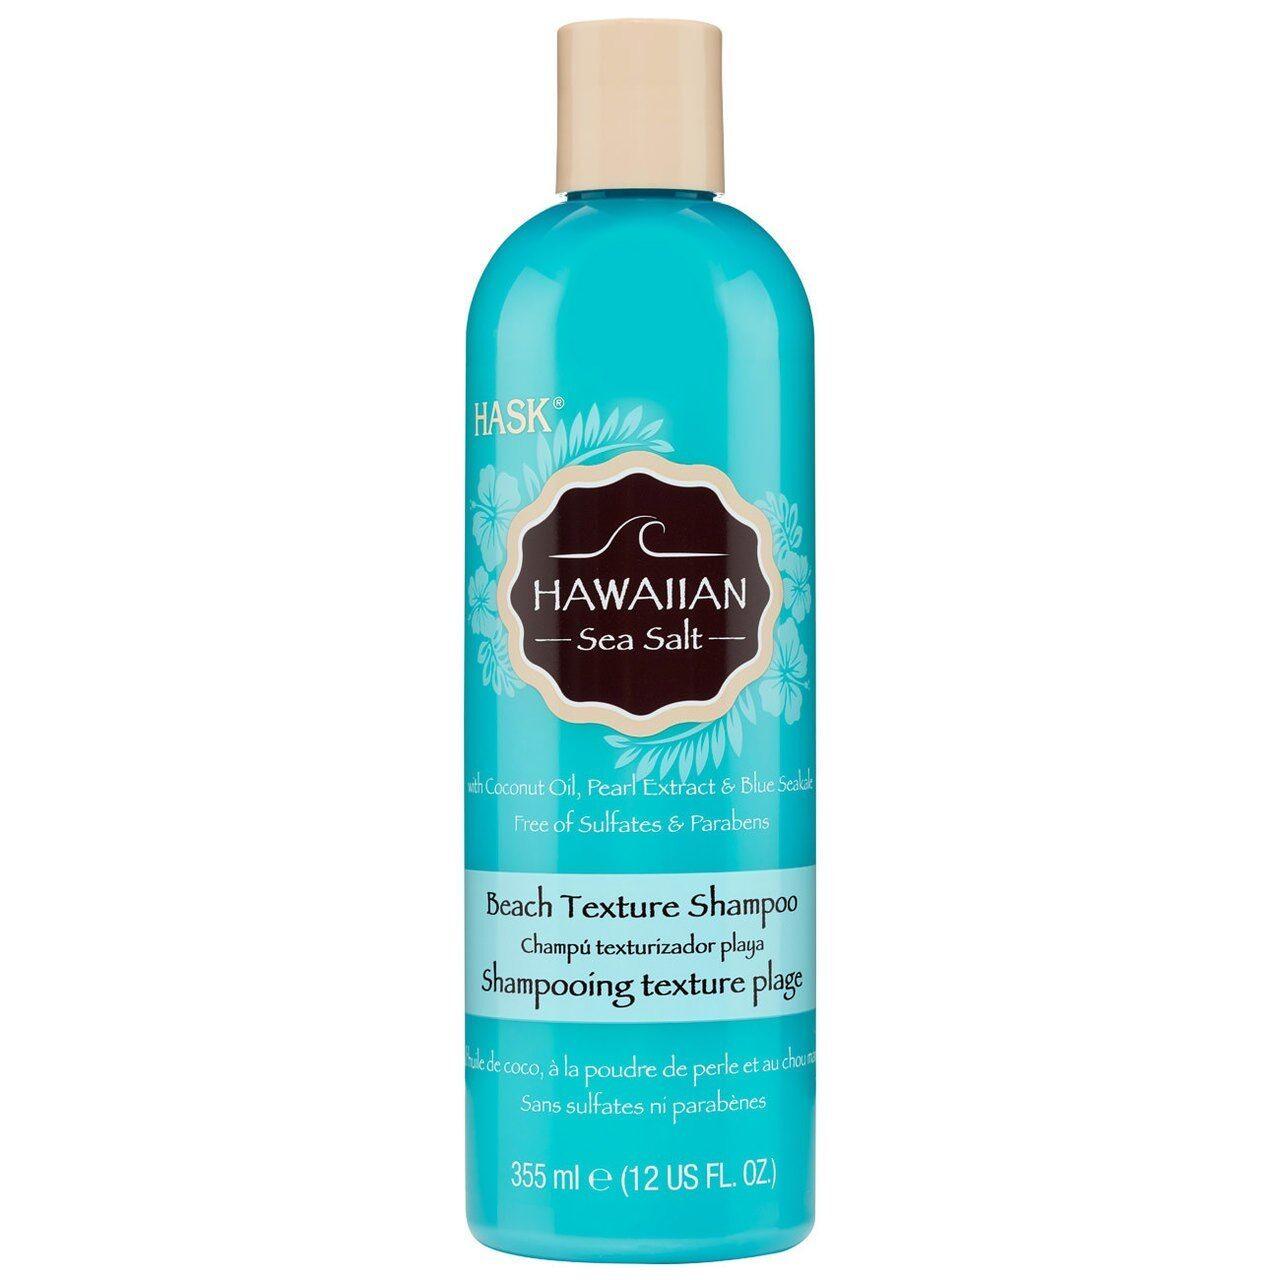 Hask Hawaiian Sea Salt Beach Texture Shampoo 12 oz